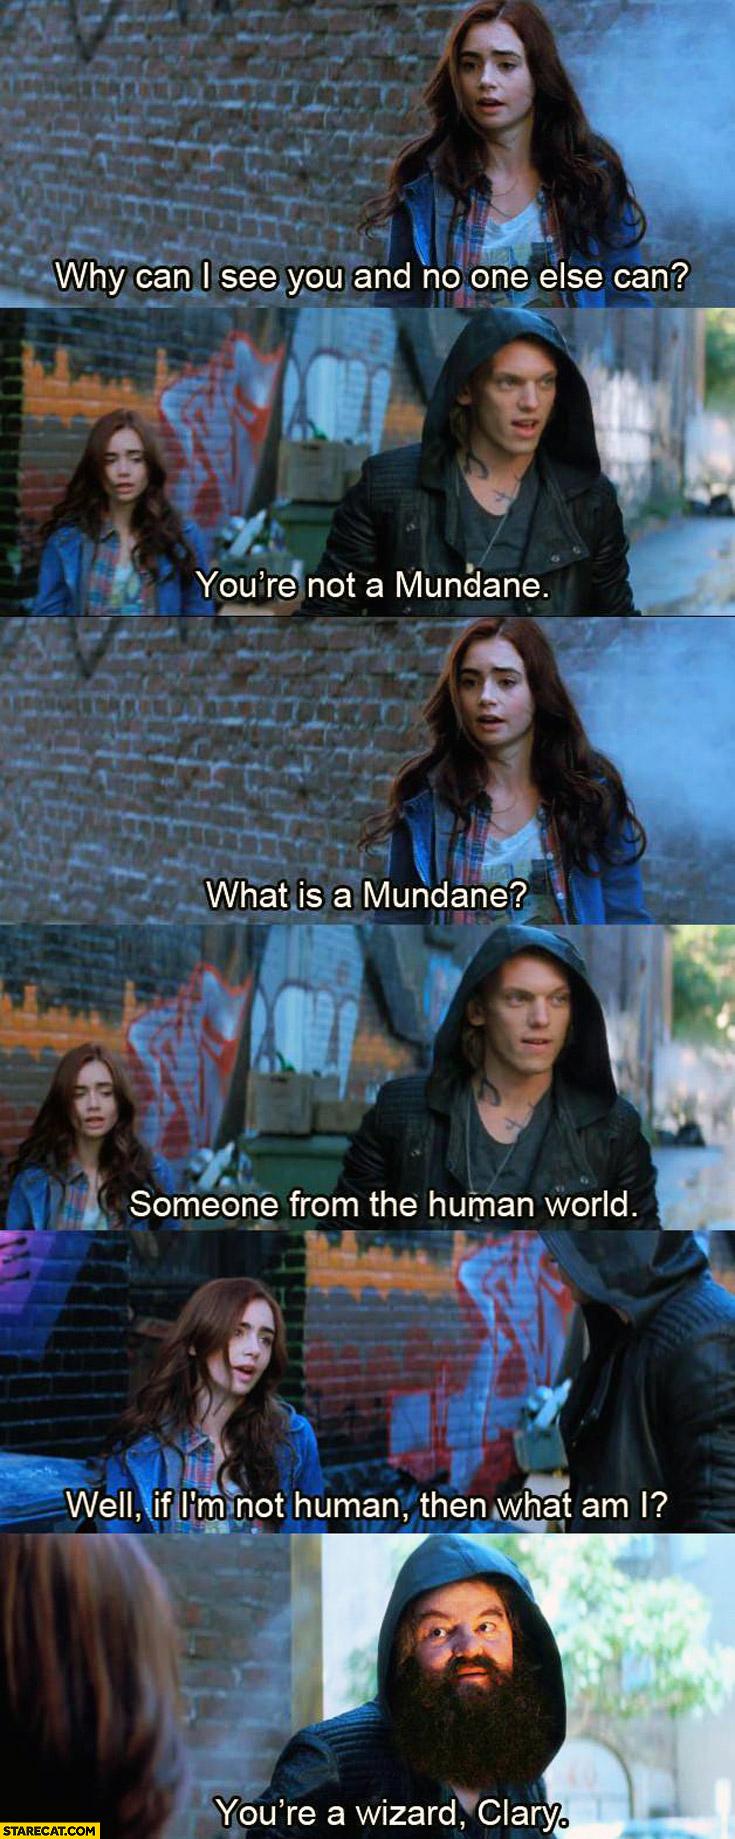 You're not a Mundane you're a wizard Clary